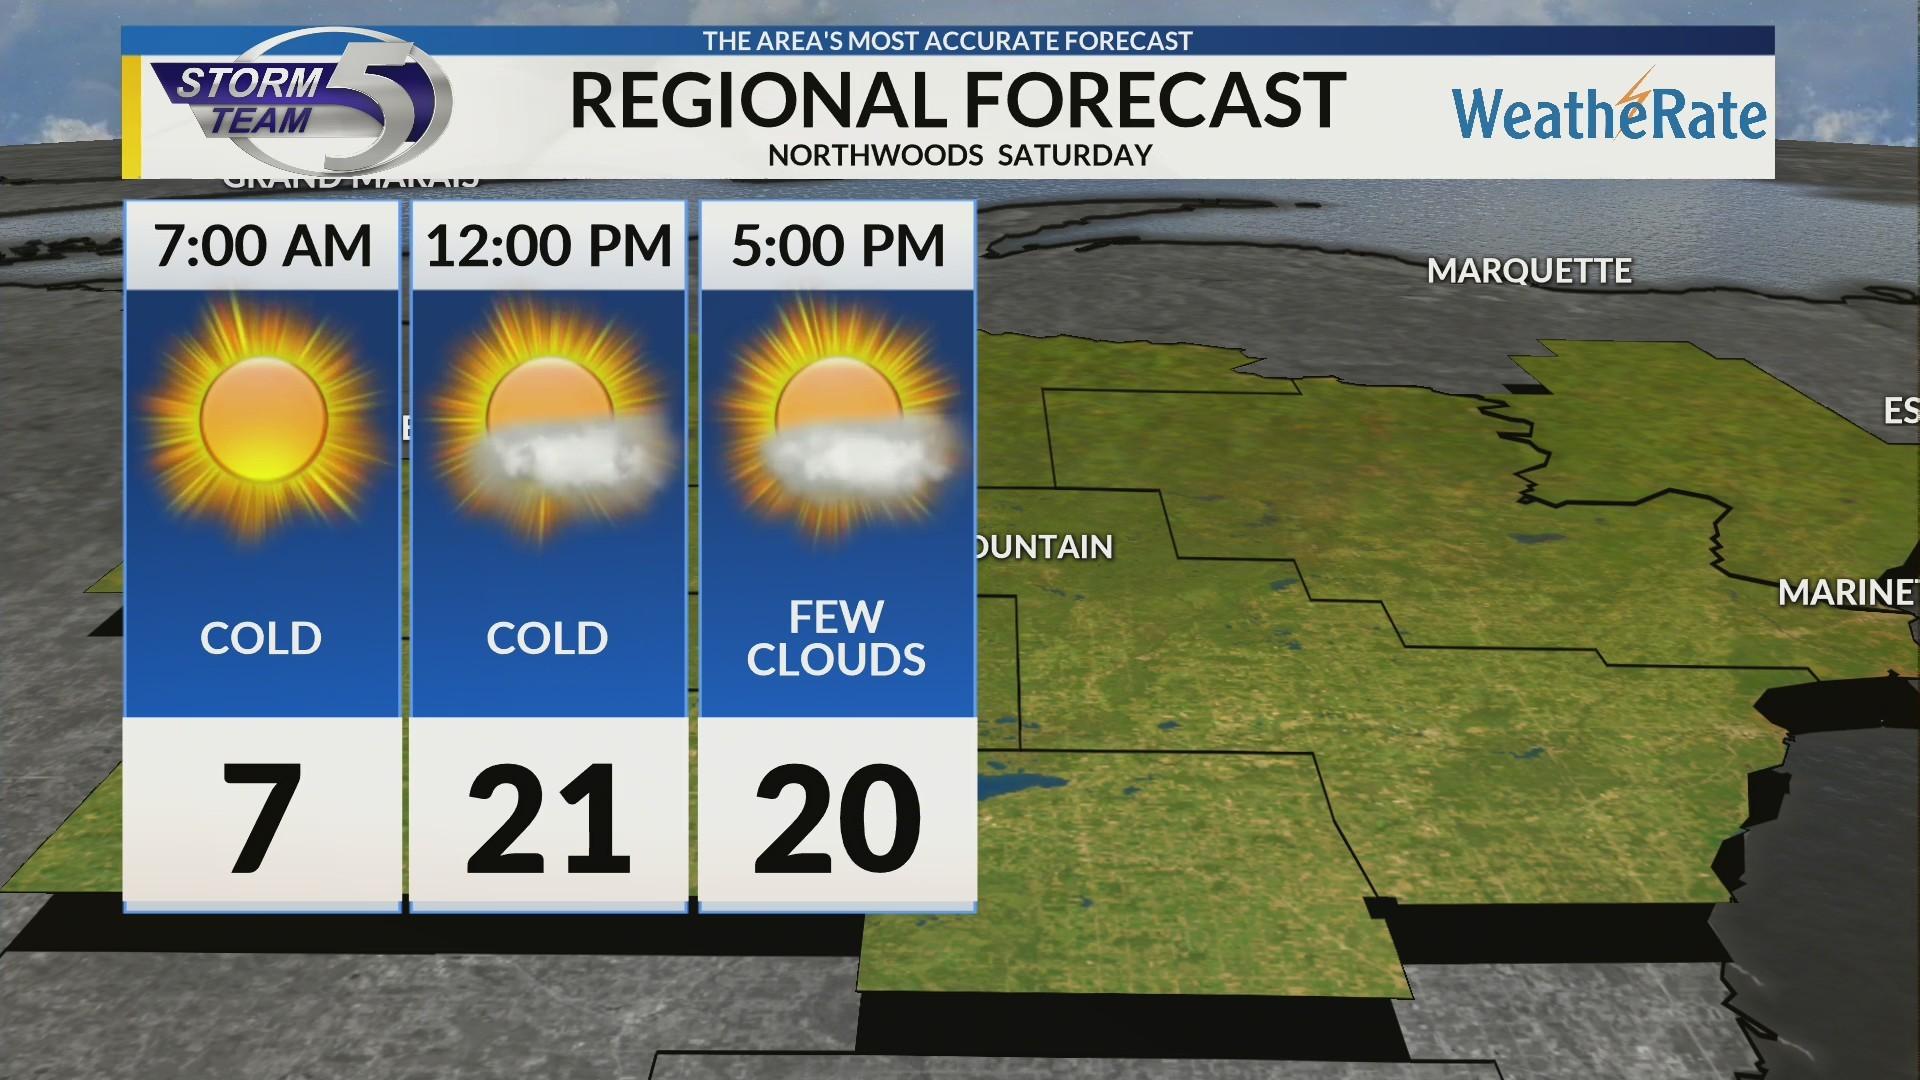 Regional Forecast: Northwoods 2/16/2019